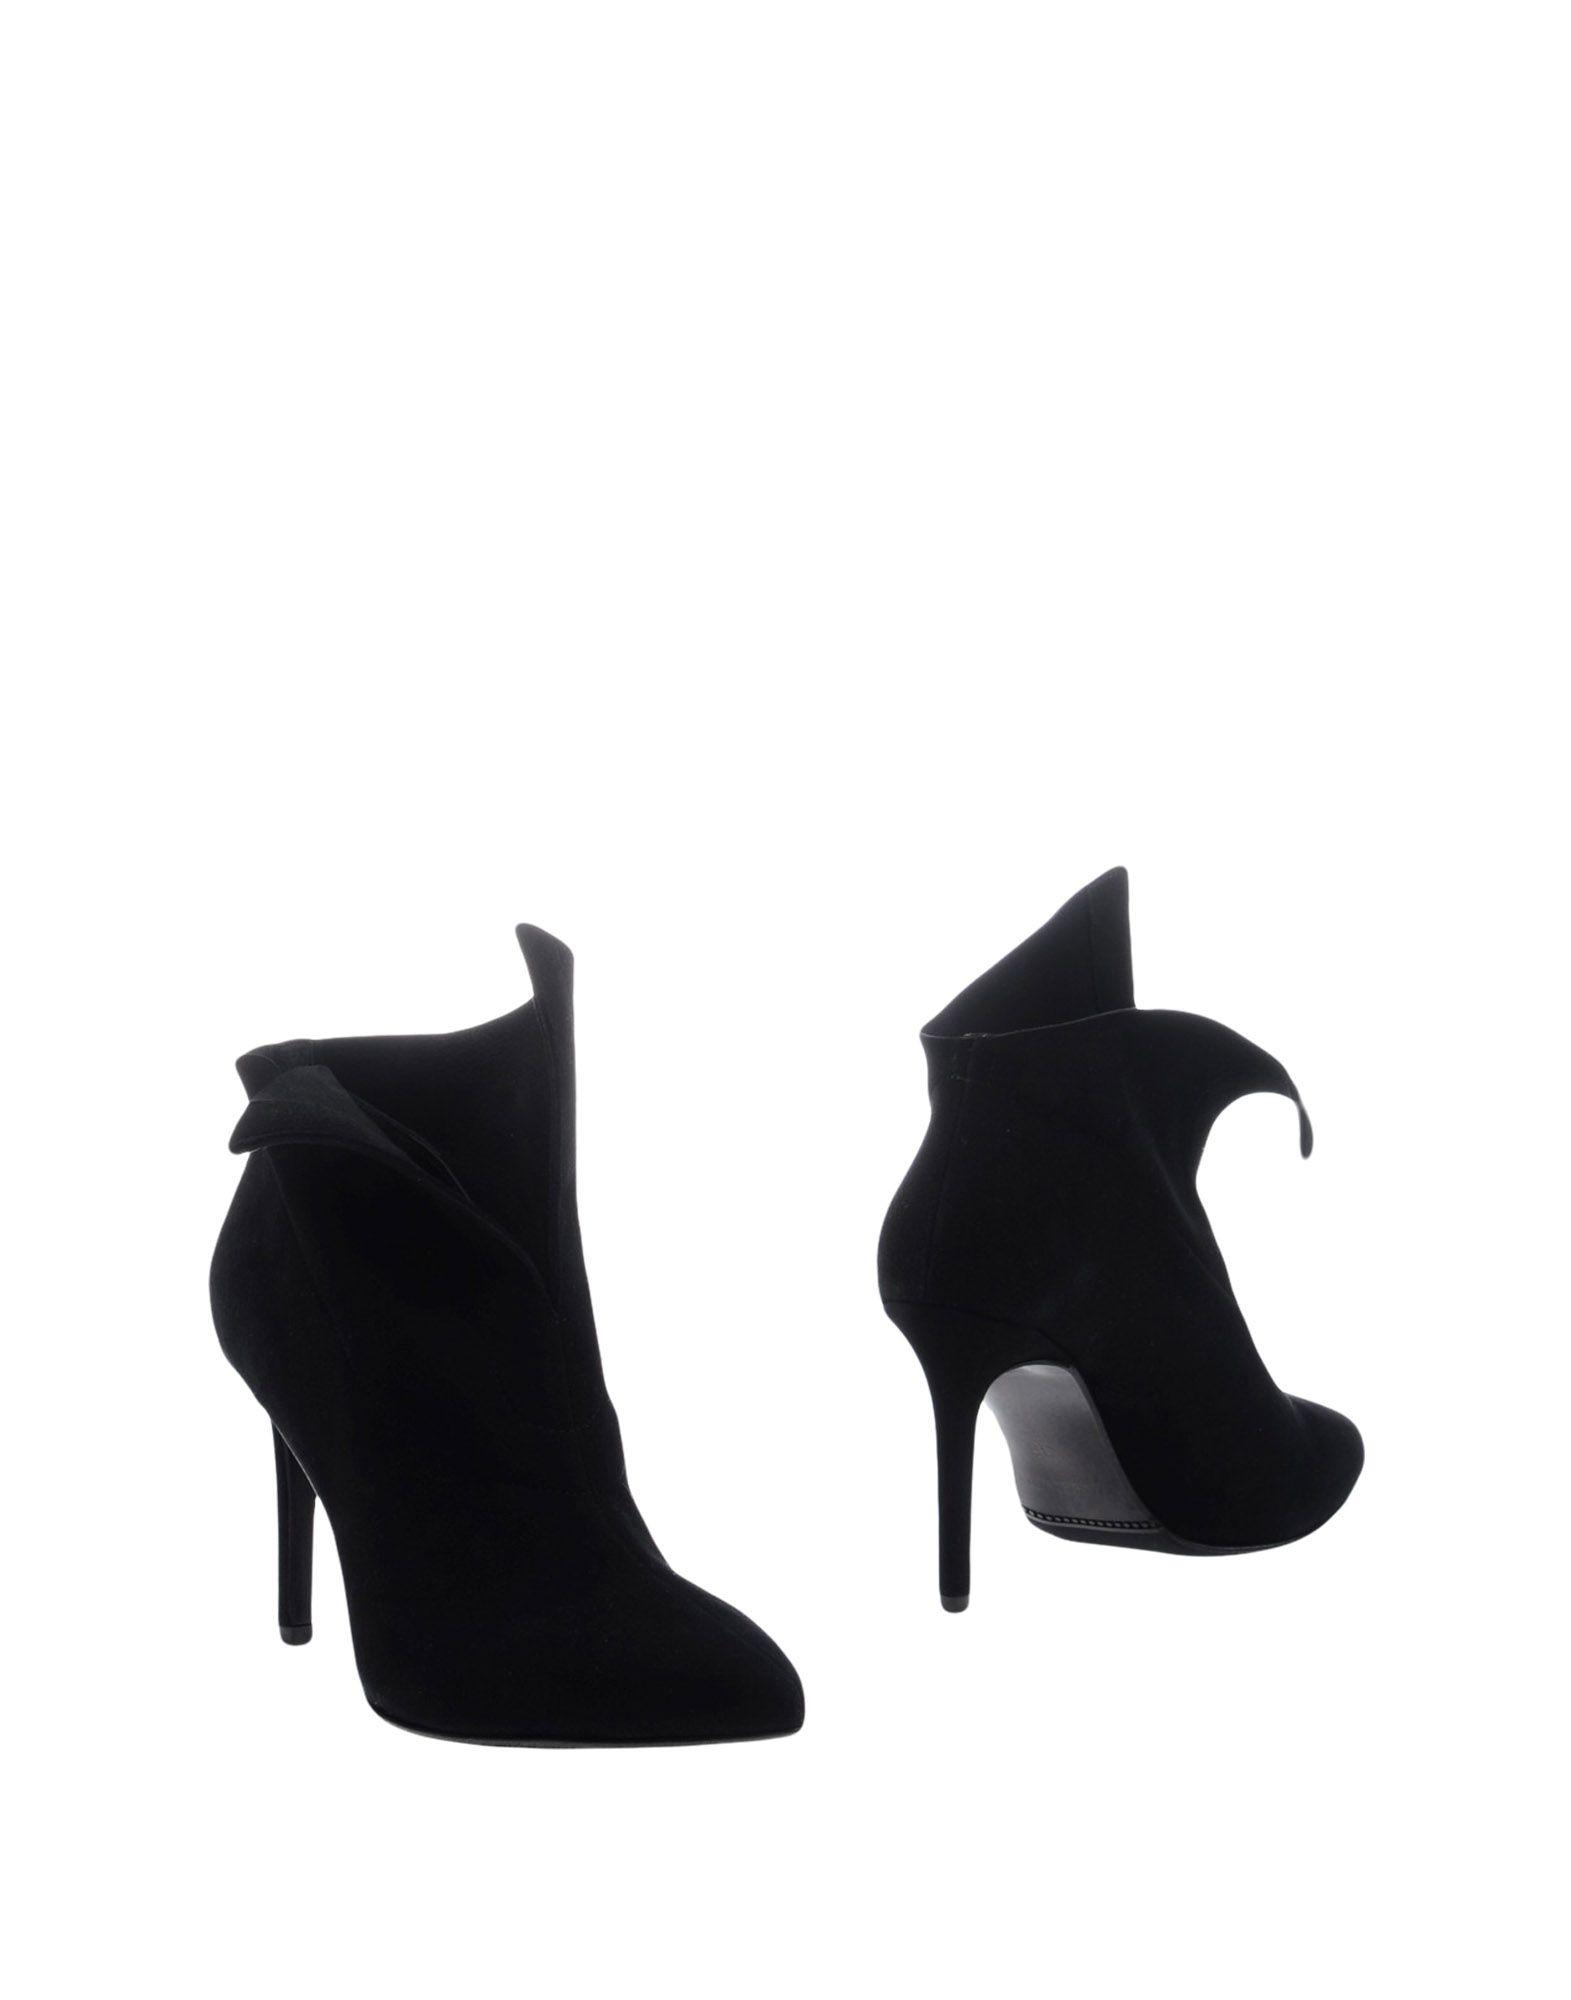 Me+ By Marc Ellis Stiefelette Damen Gute  11255046BM Gute Damen Qualität beliebte Schuhe a9b3f0